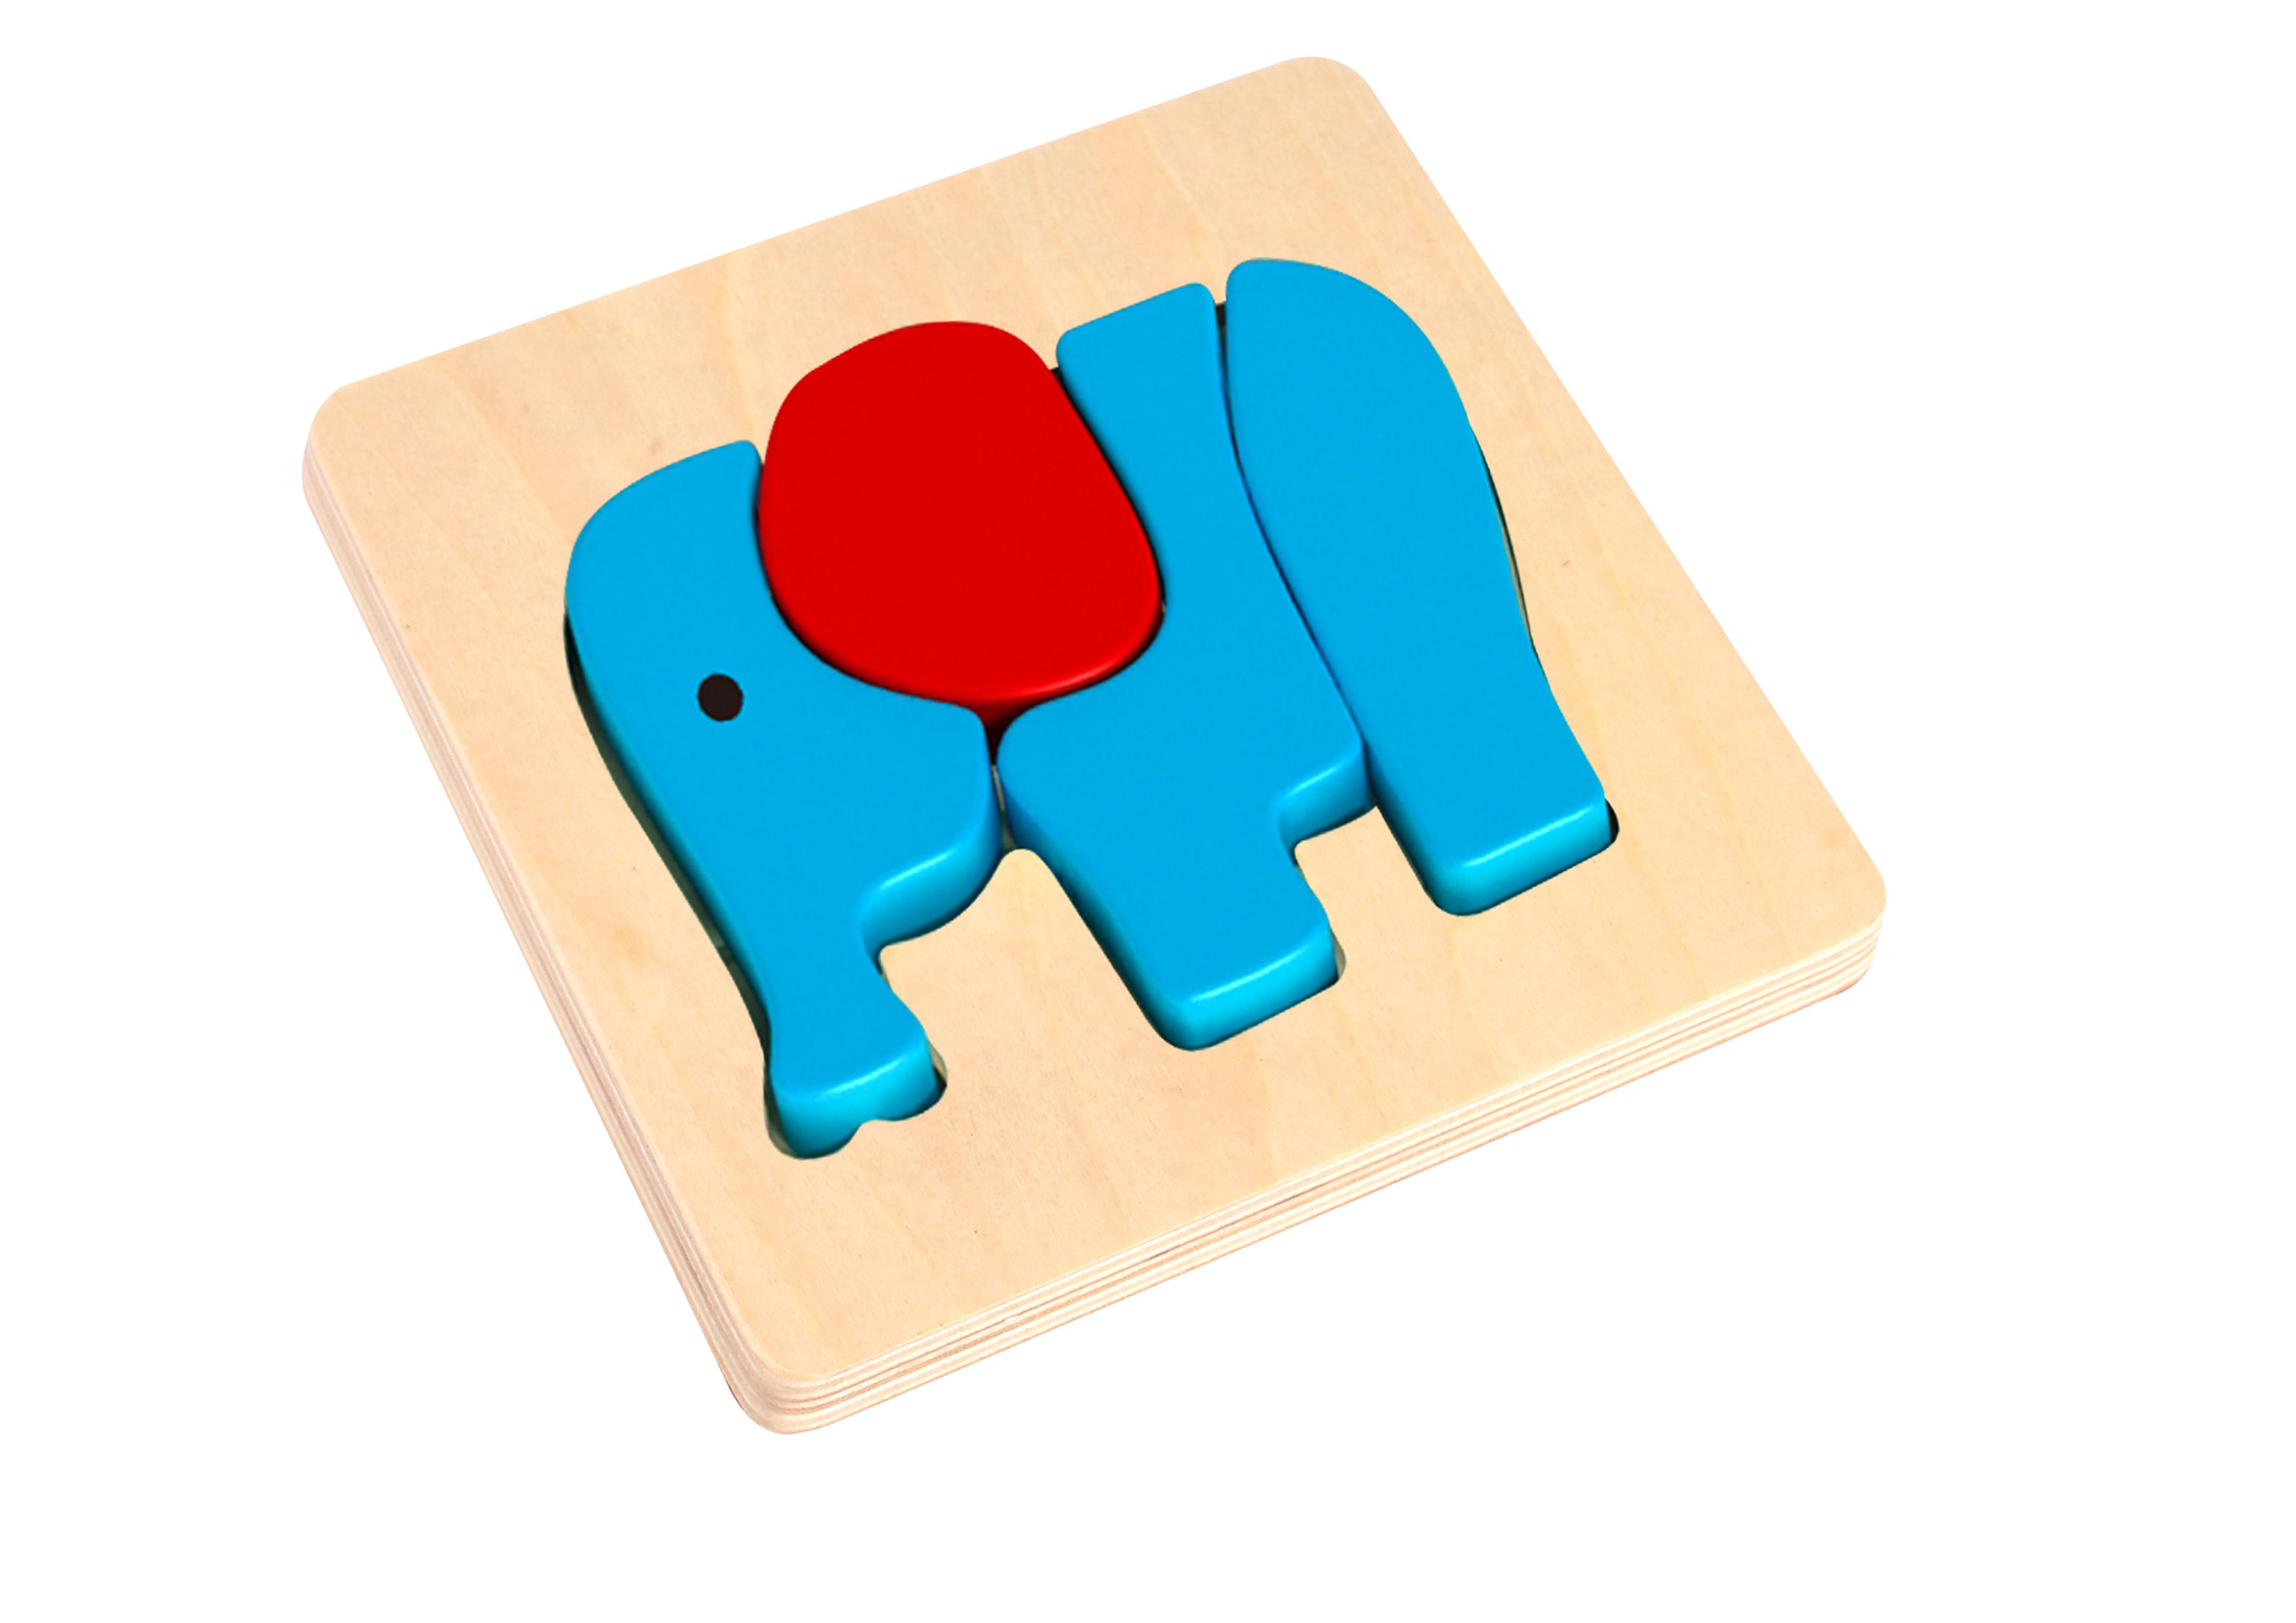 Mini puzzle lemn elefant tooky toy imagine